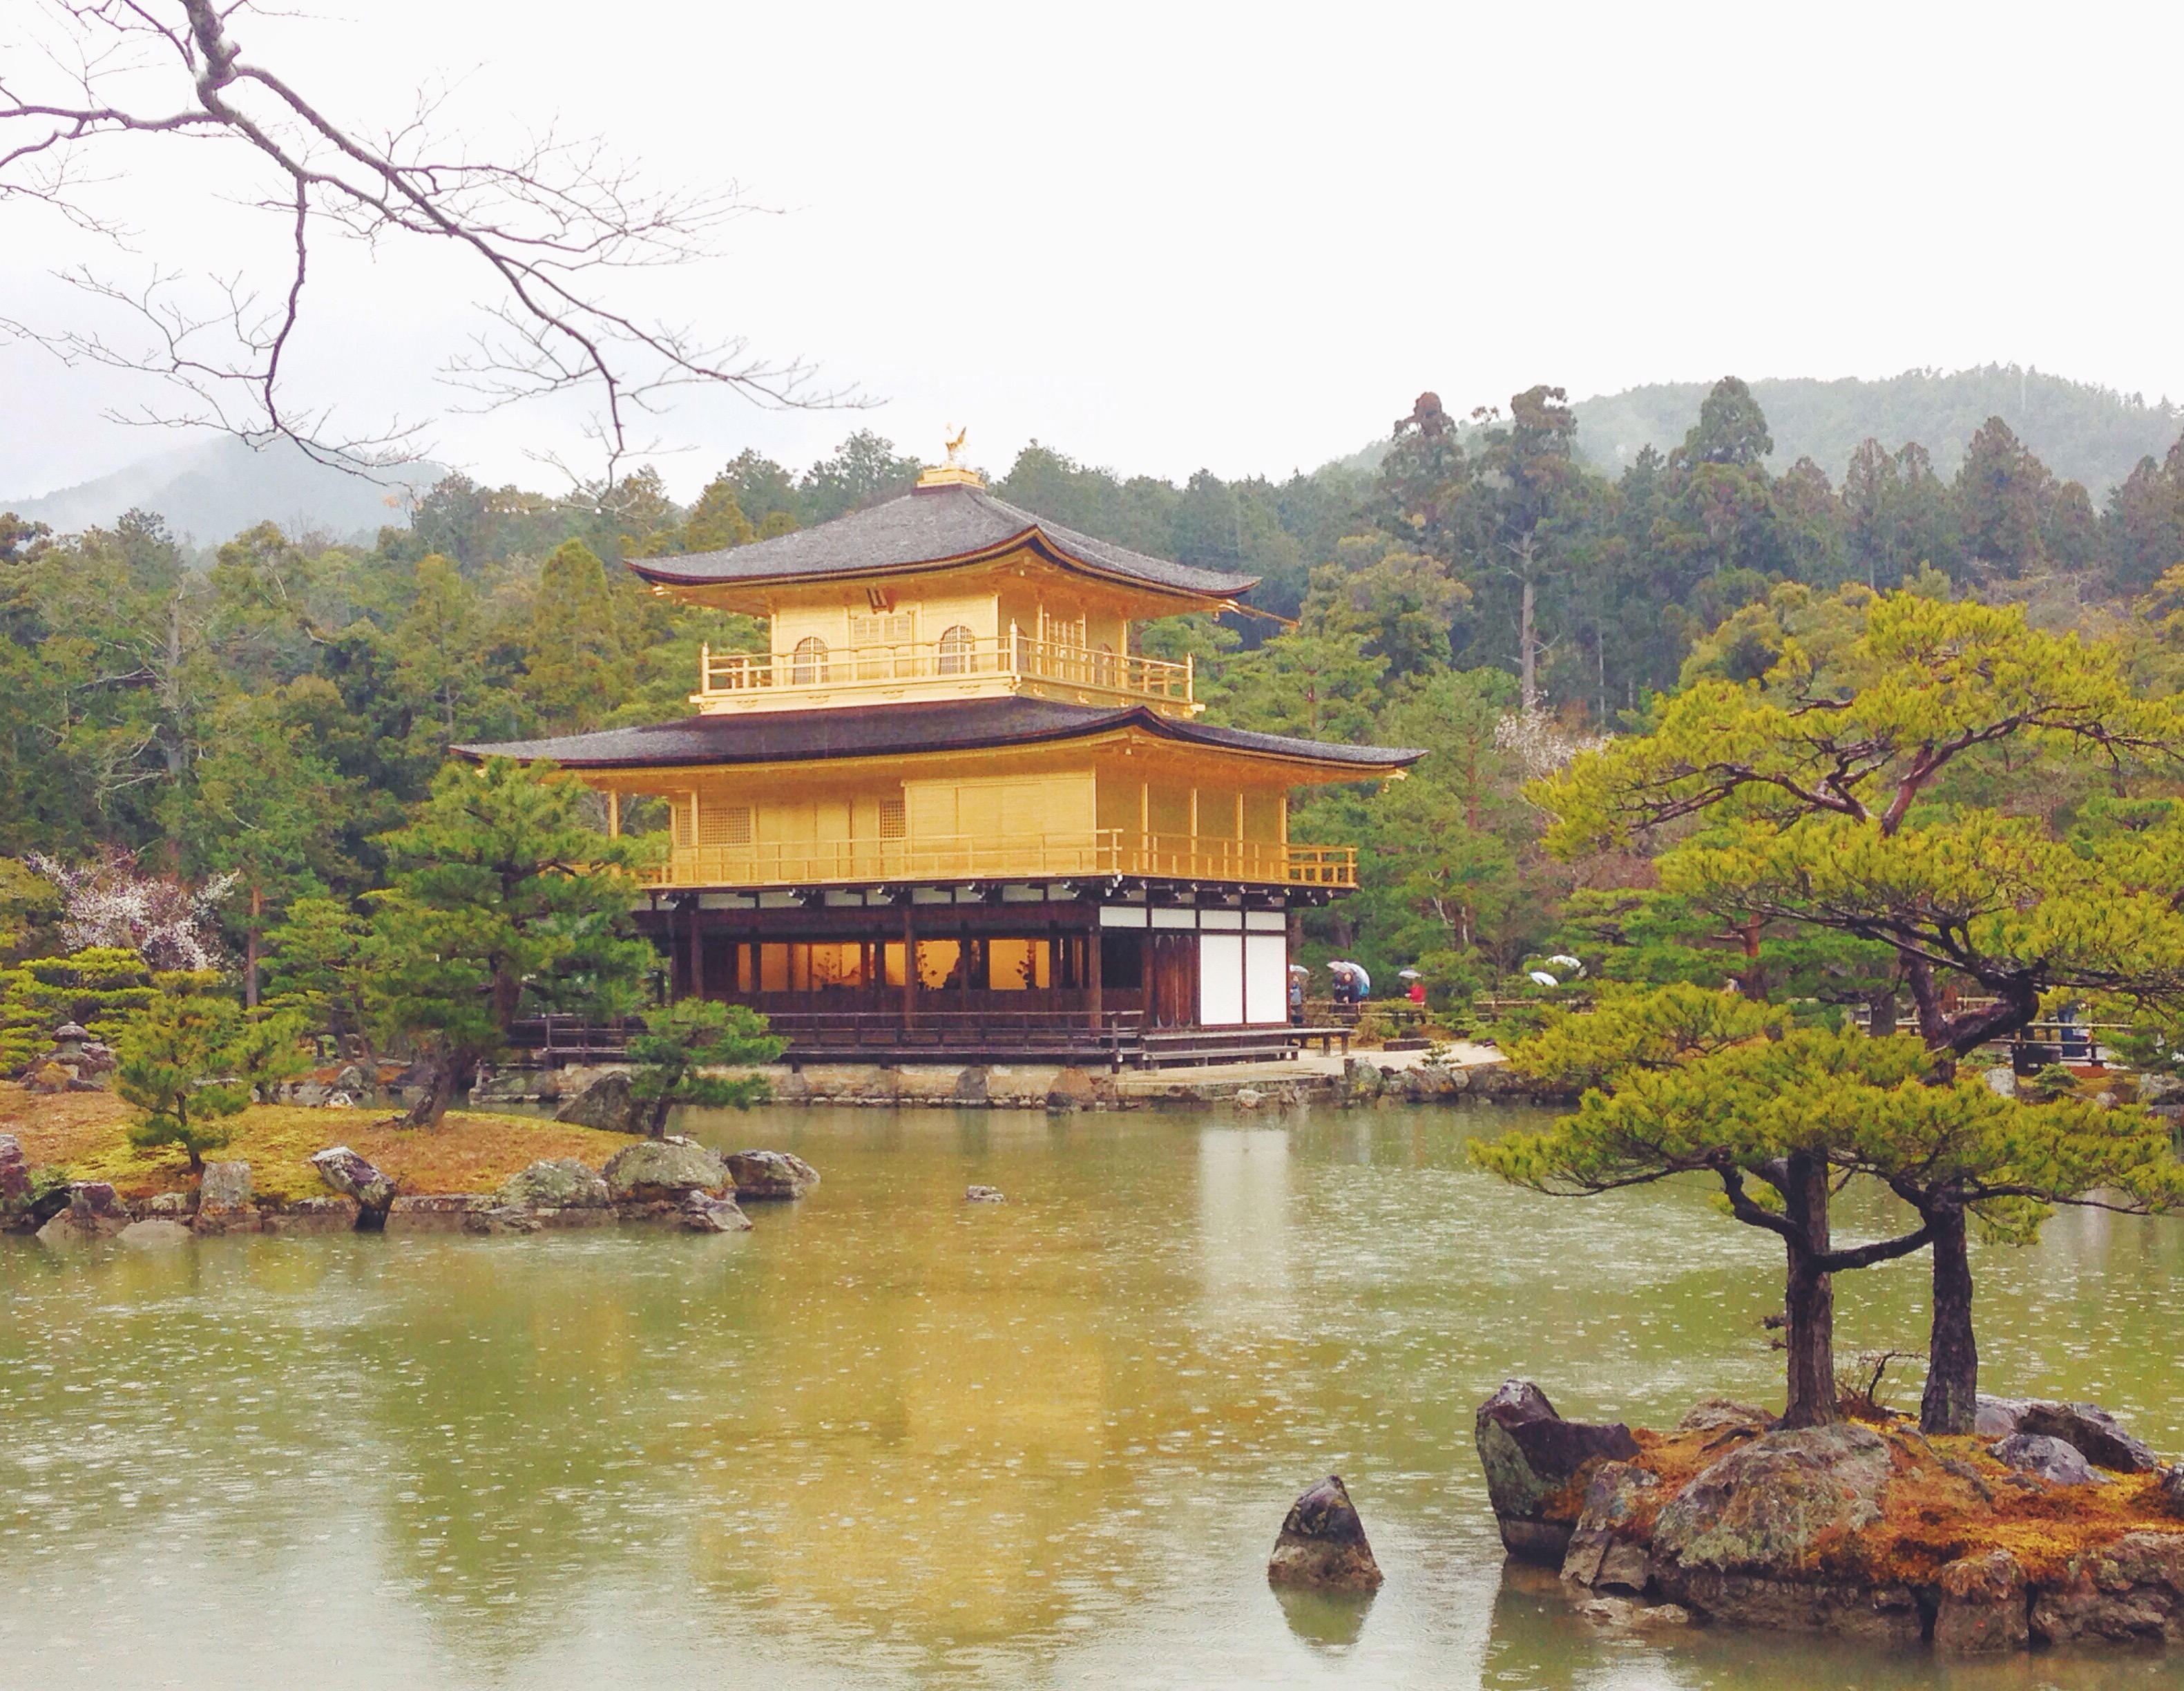 Il Kinkaku-ji o Padiglione d'oro